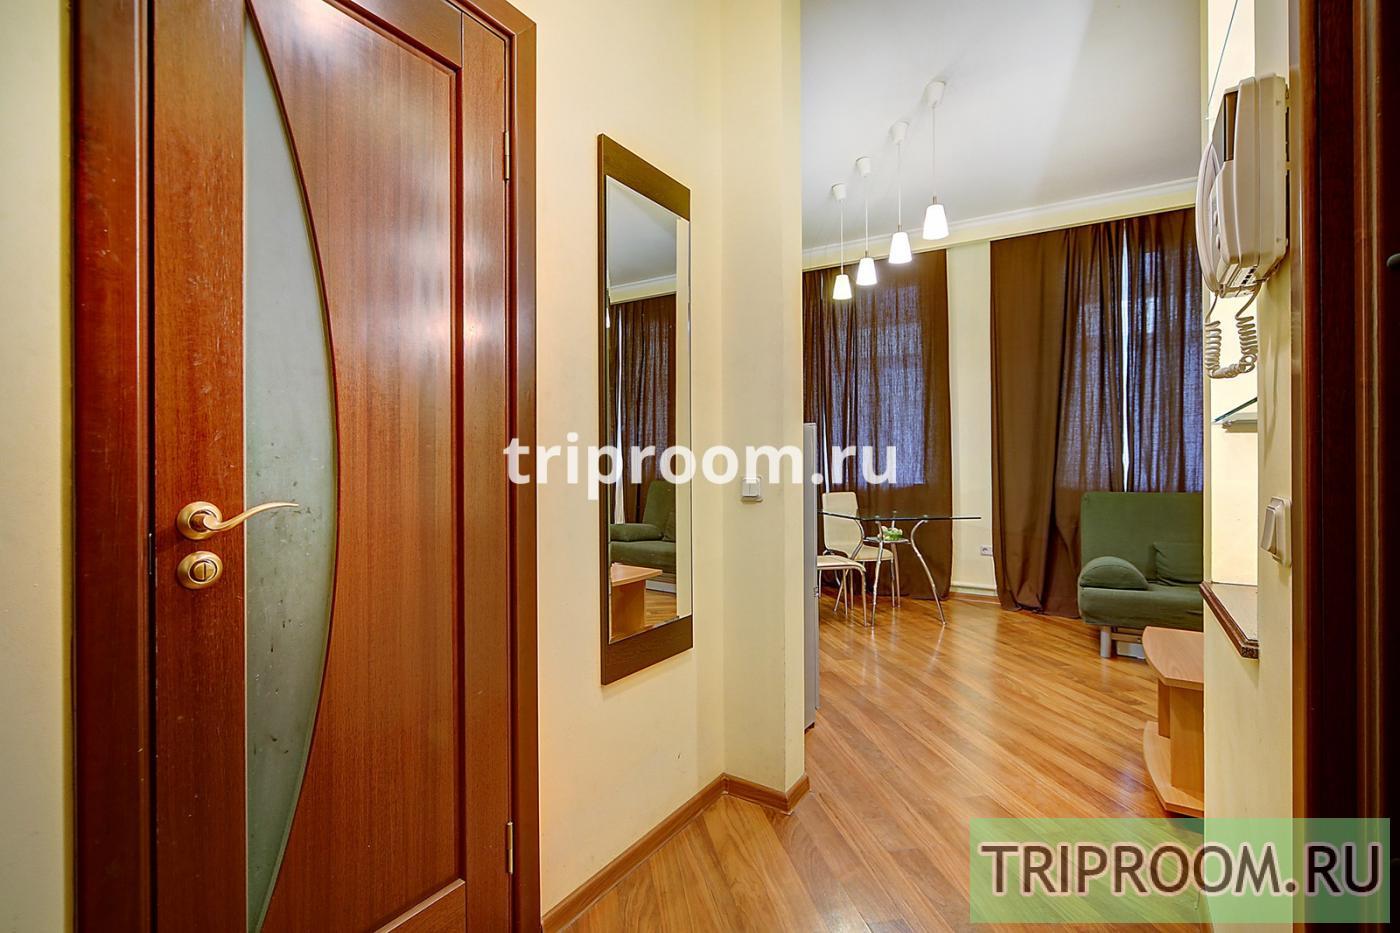 1-комнатная квартира посуточно (вариант № 15117), ул. Канала Грибоедова набережная, фото № 12